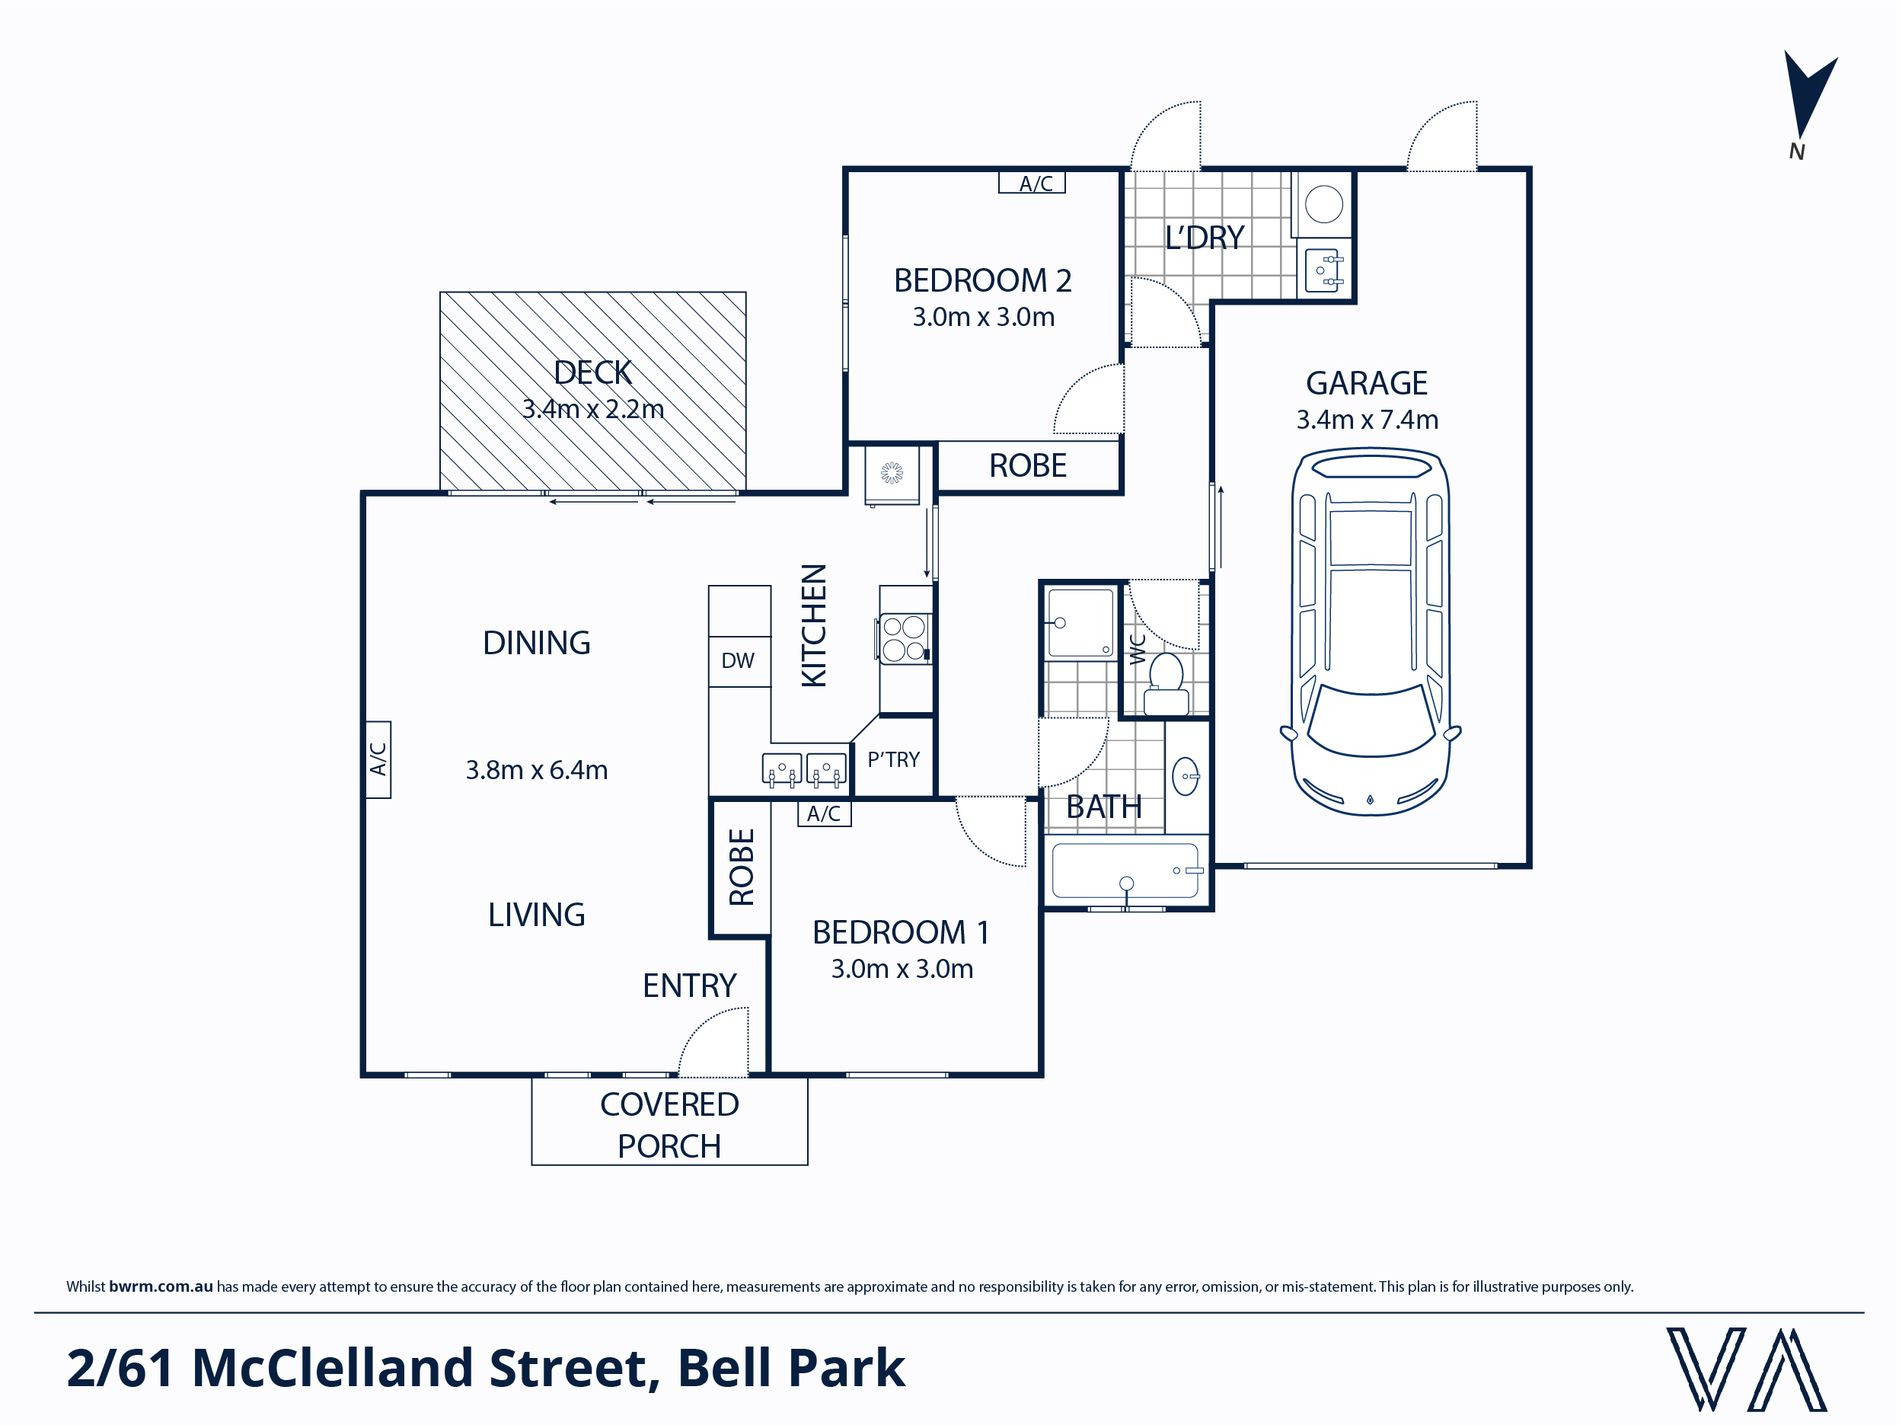 2 / 61 McClelland Street, Bell Park